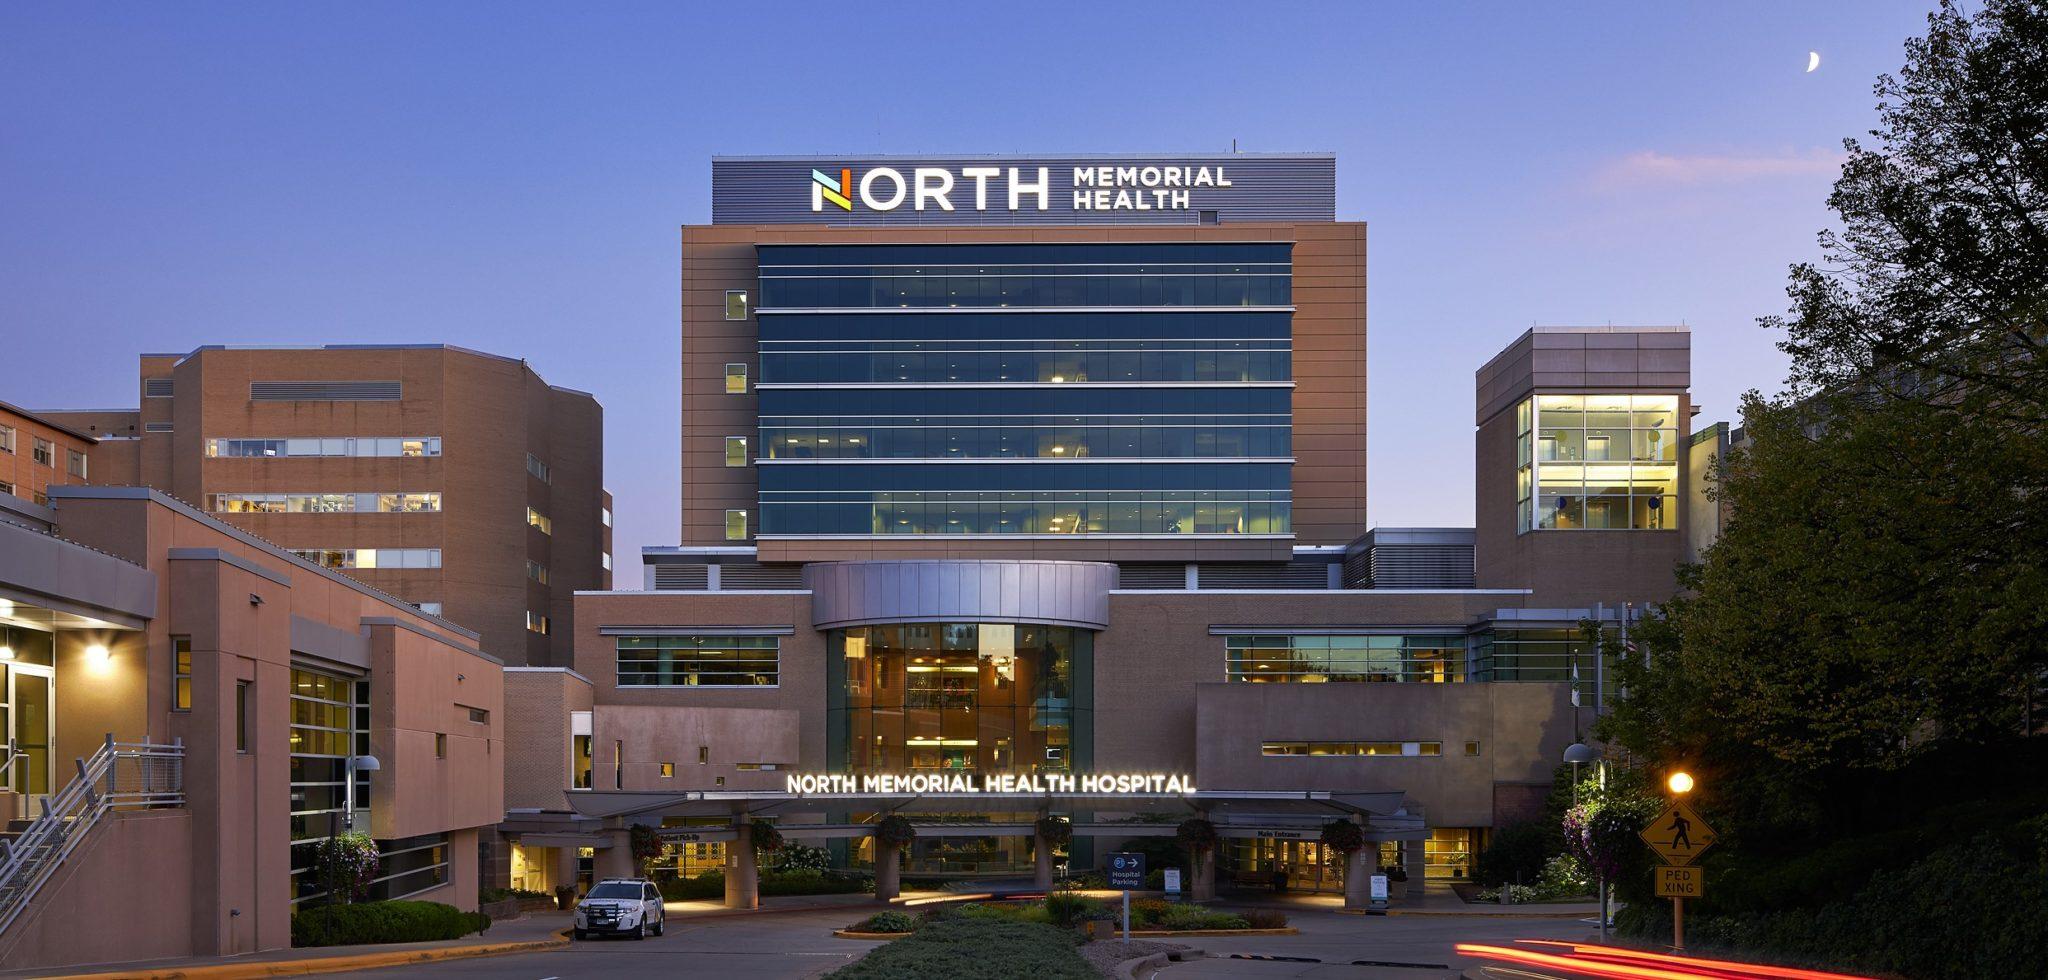 north memorial health hospital